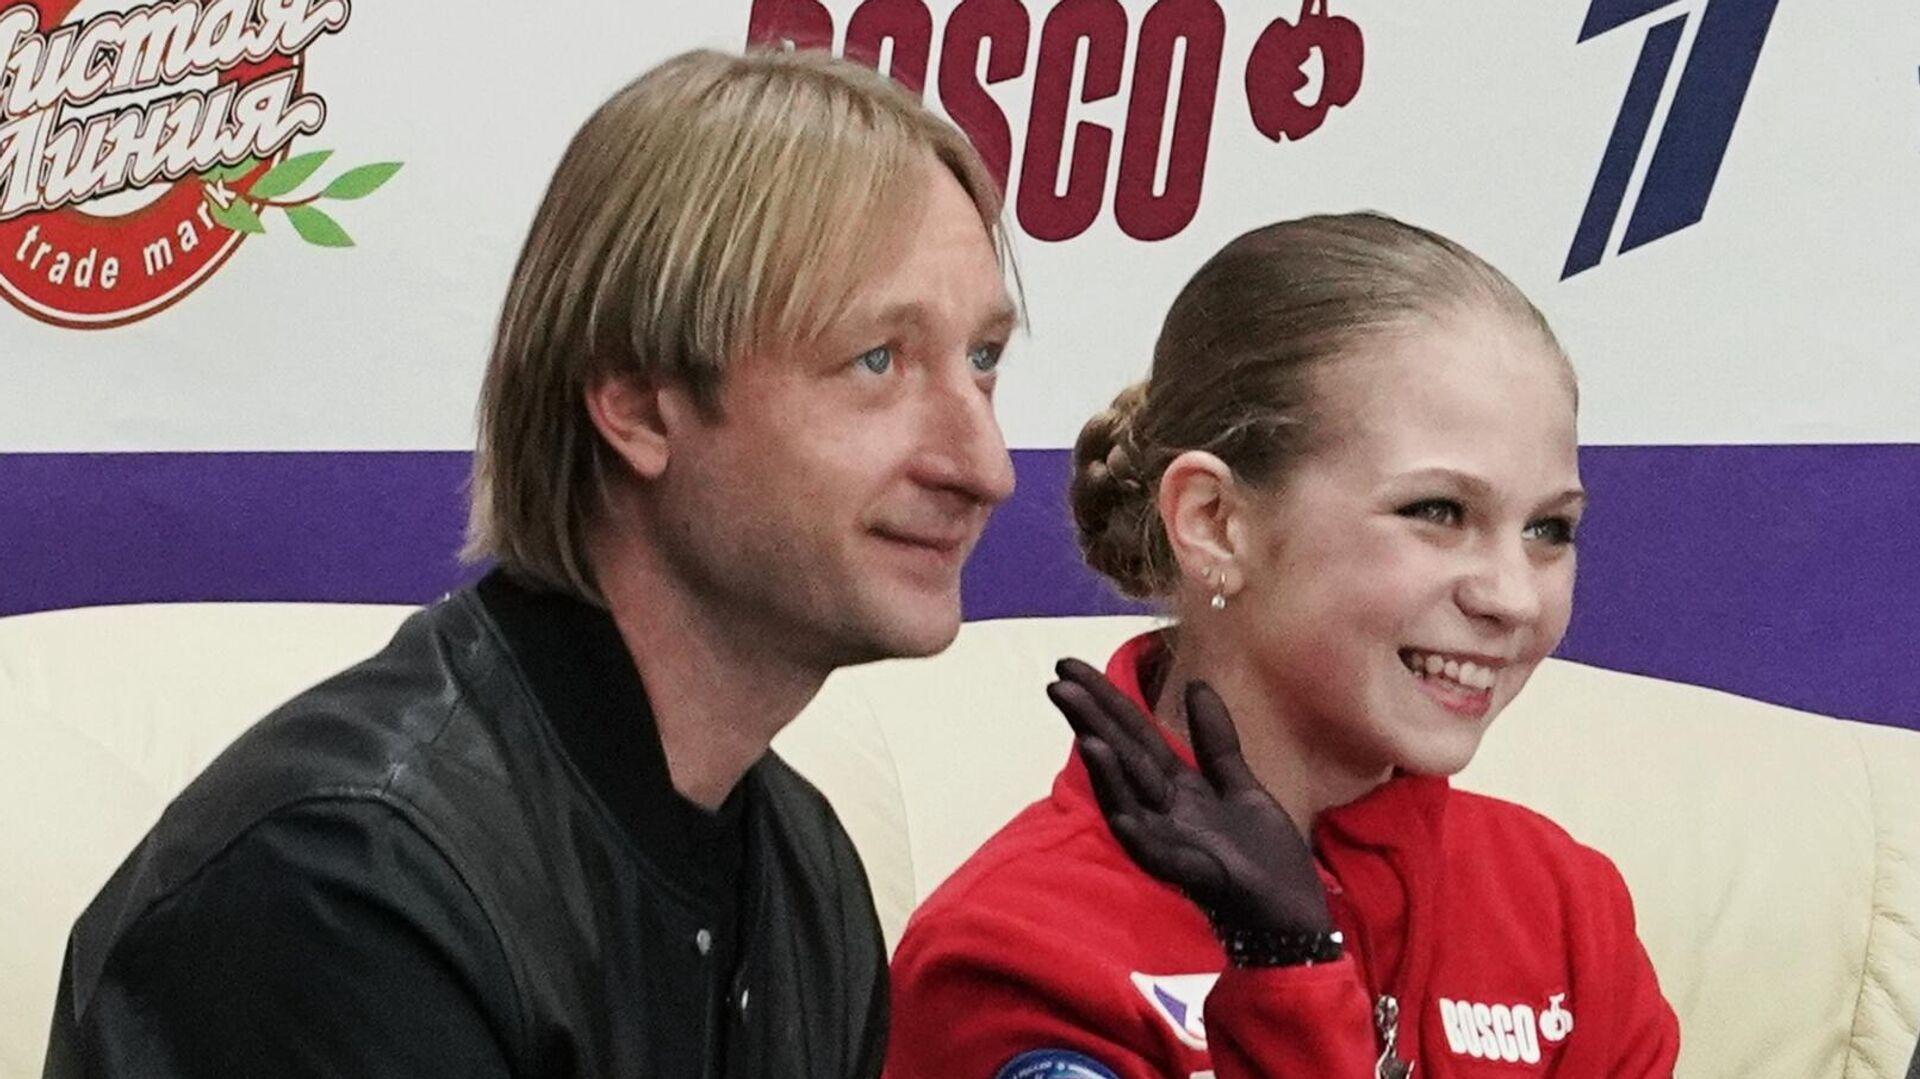 Александра Трусова и тренер Евгений Плющенко - РИА Новости, 1920, 27.01.2021